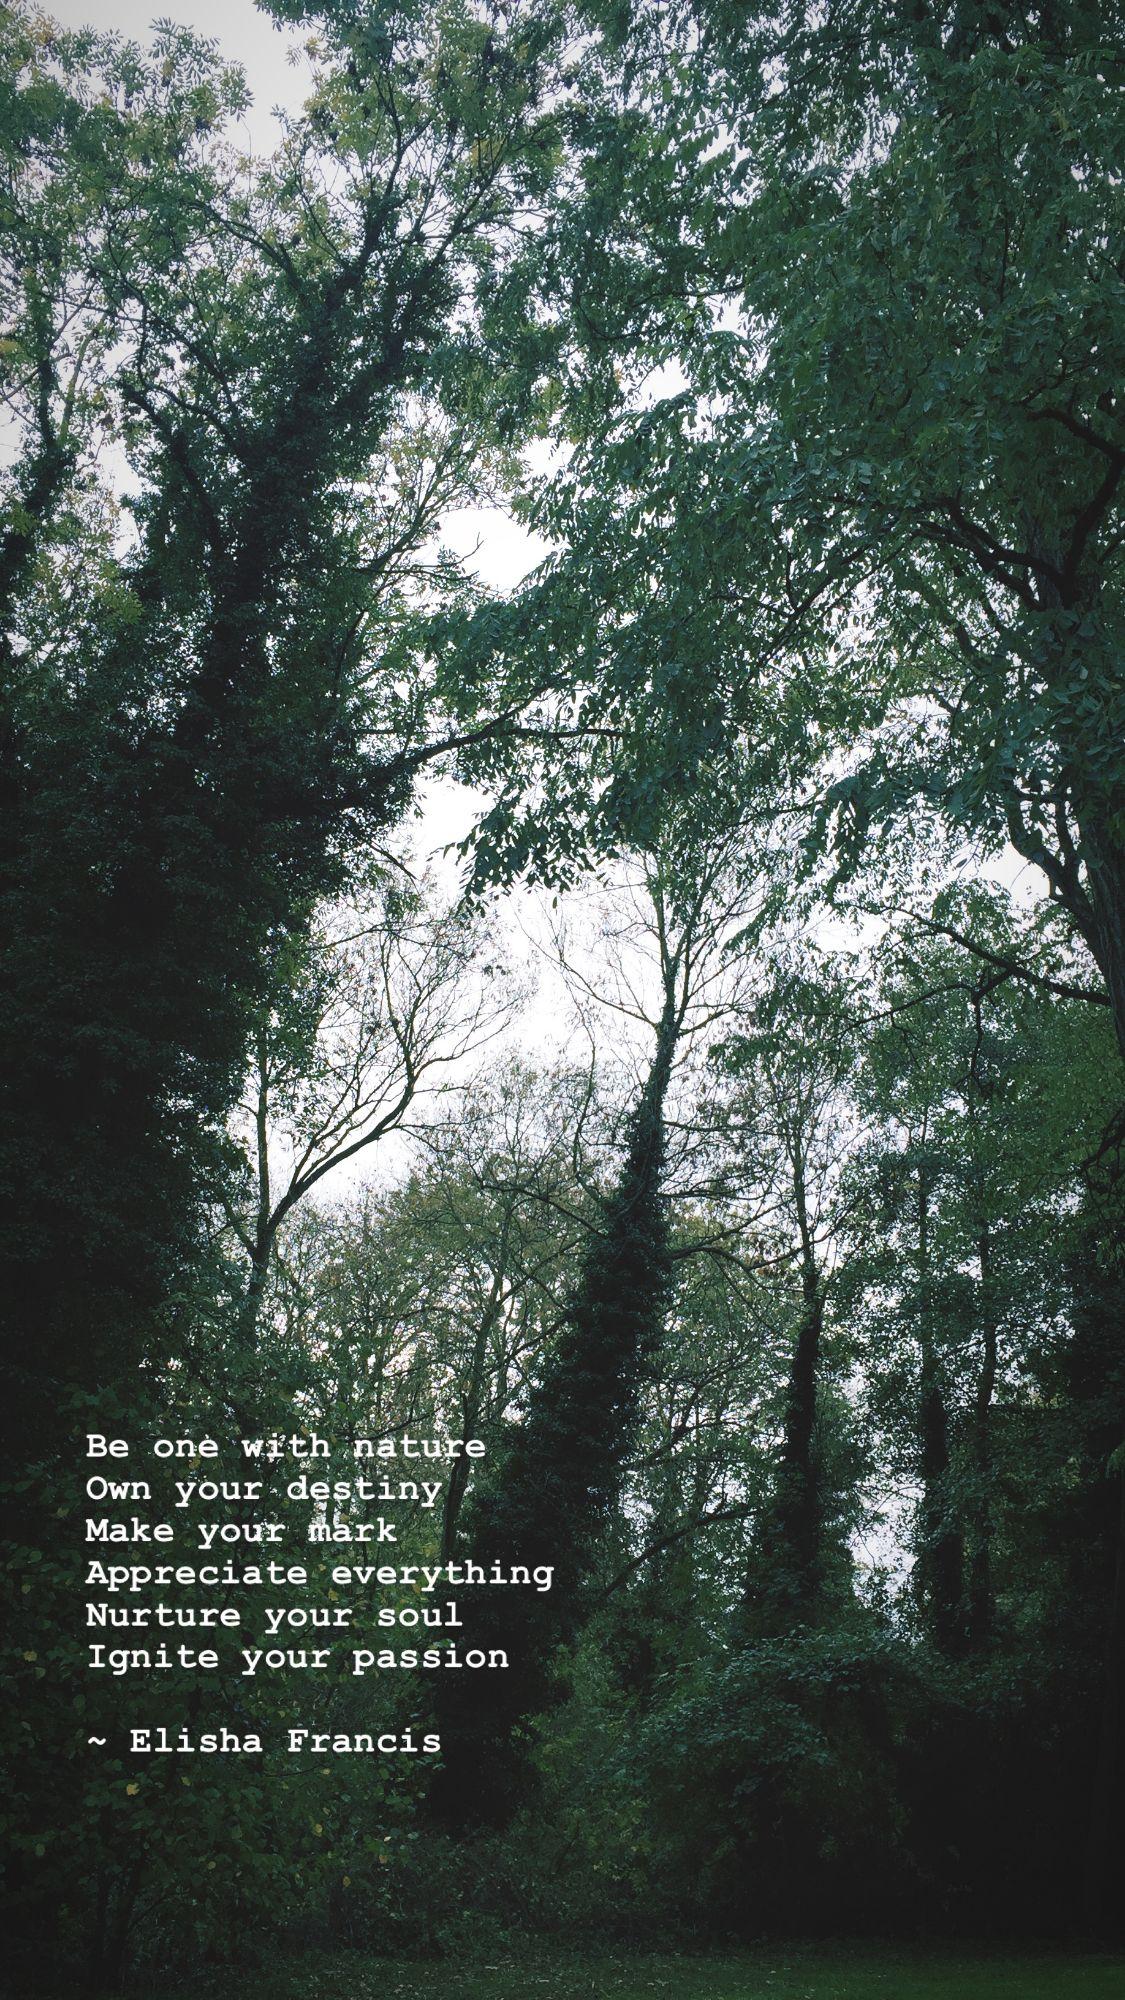 Nature poem by Elisha Francis 2018